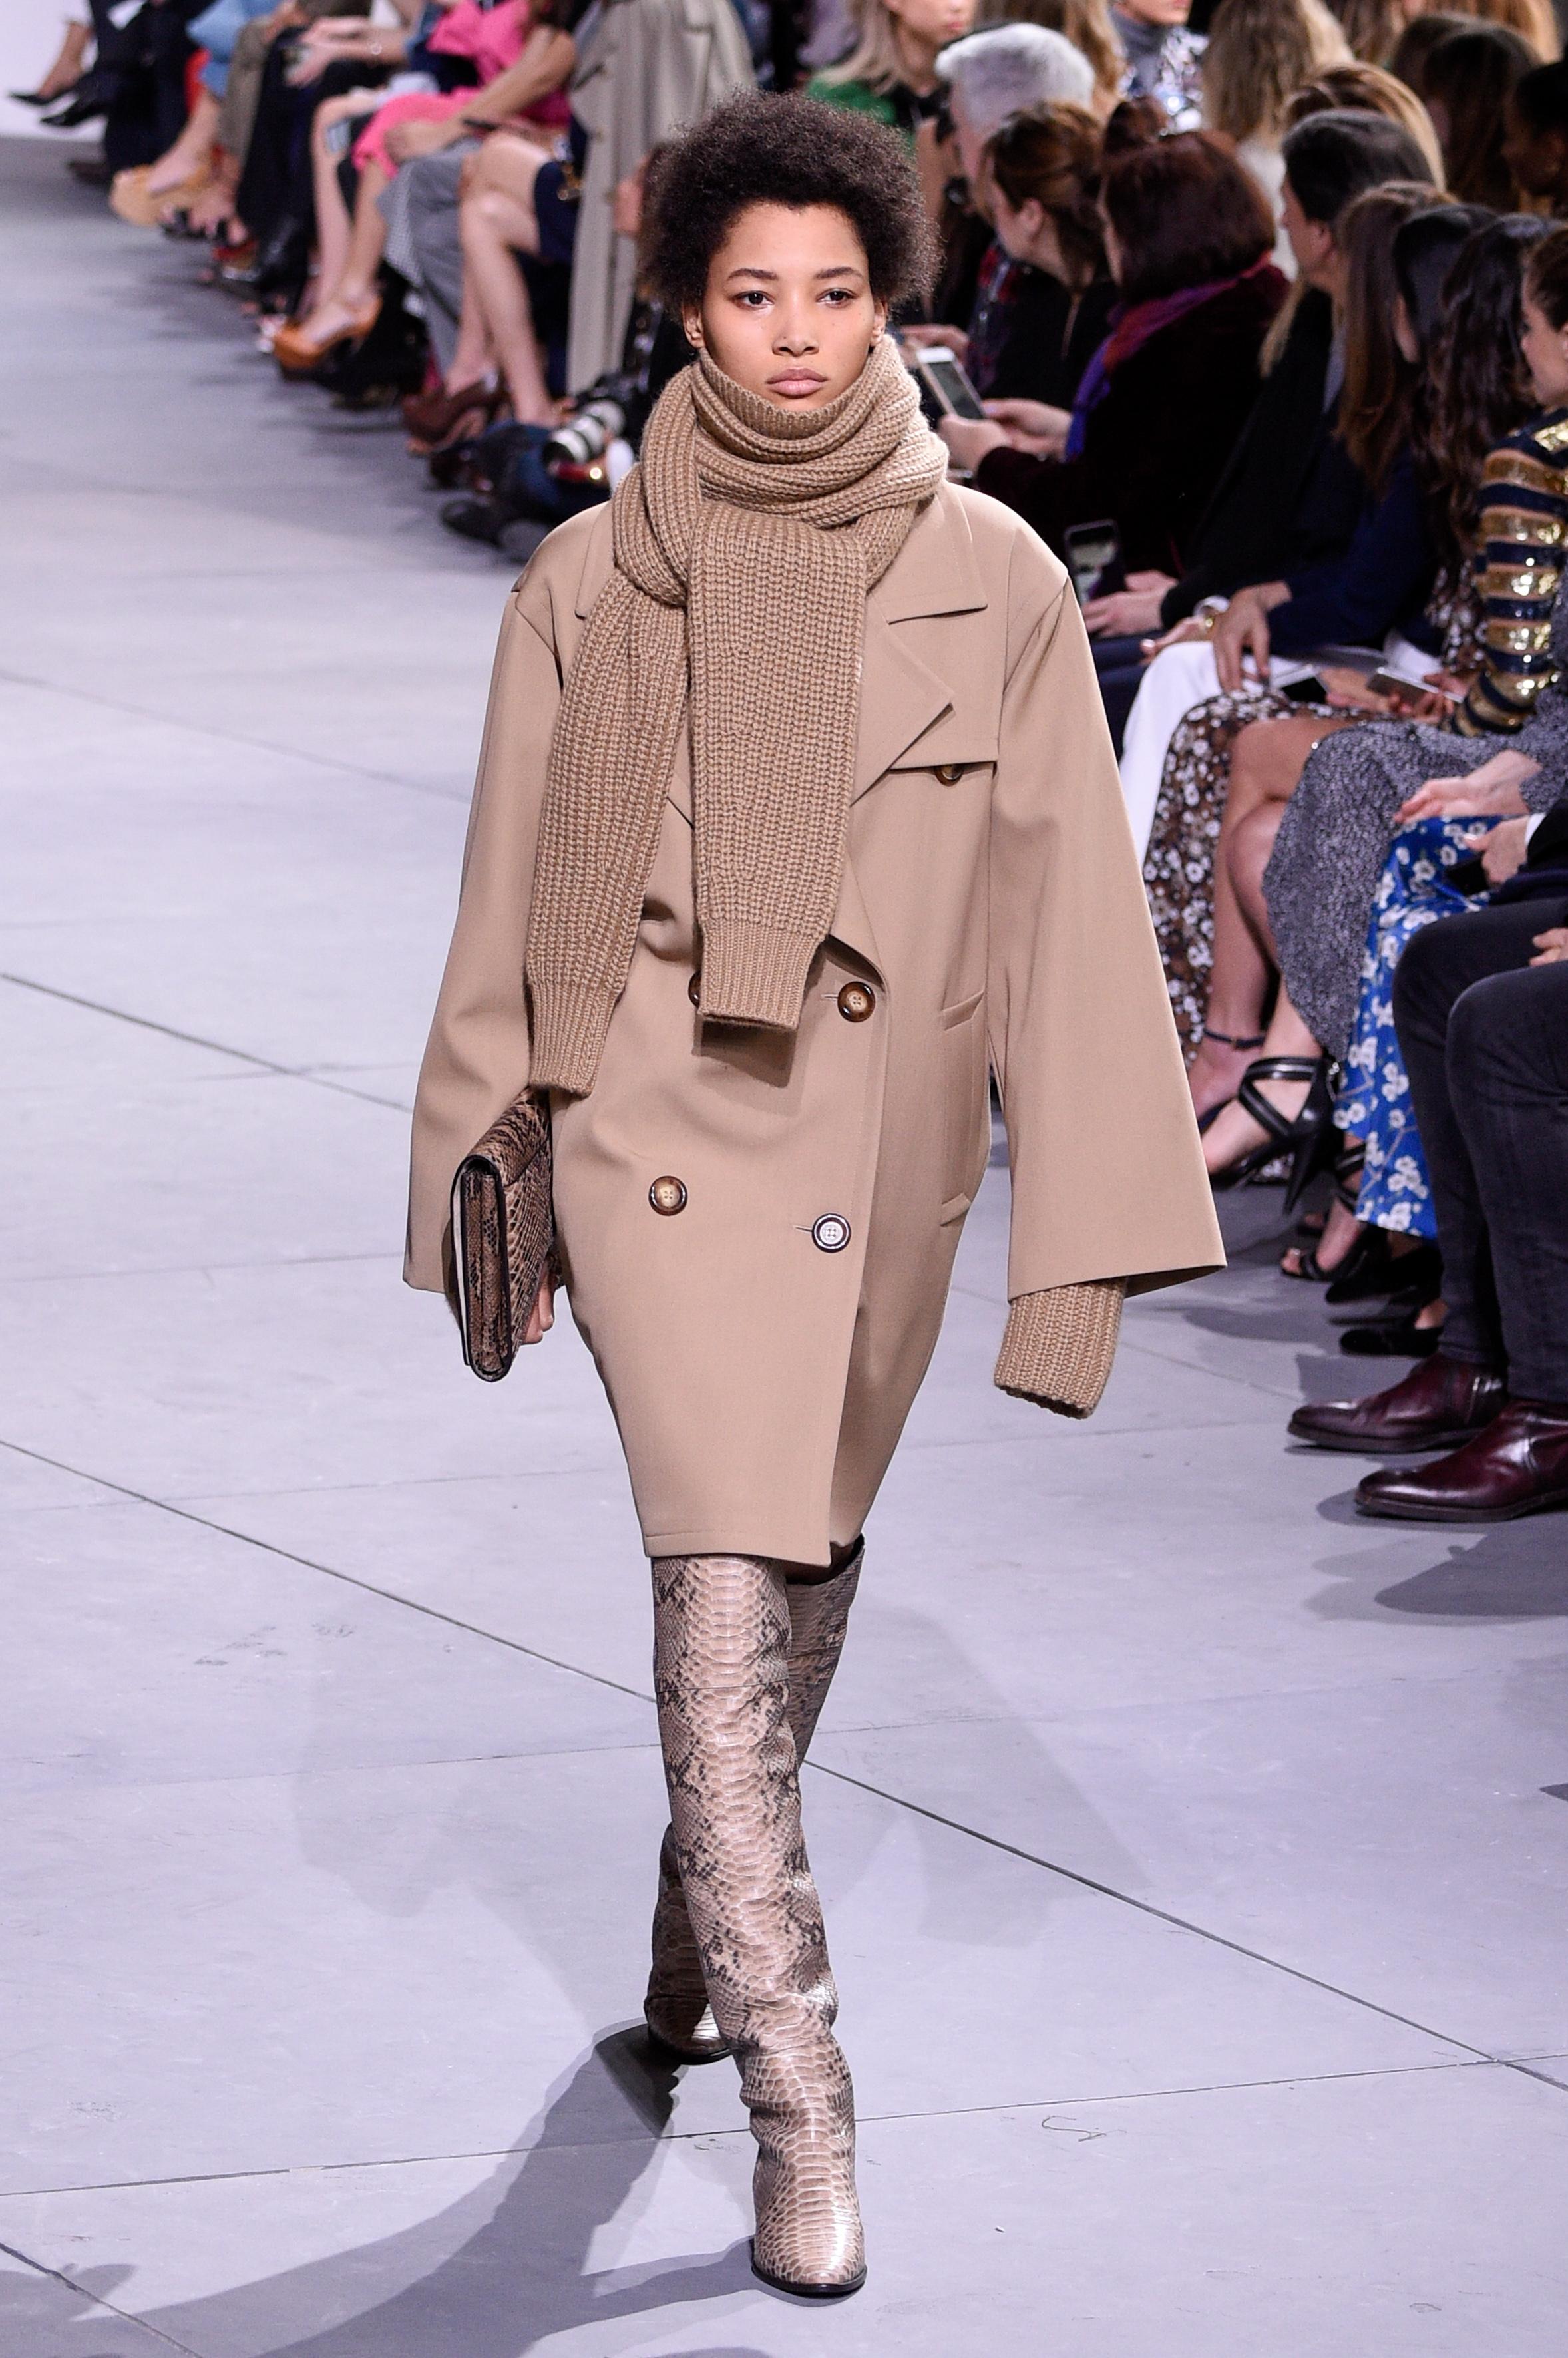 Michael Kors - Runway - February 2017 - New York Fashion Week